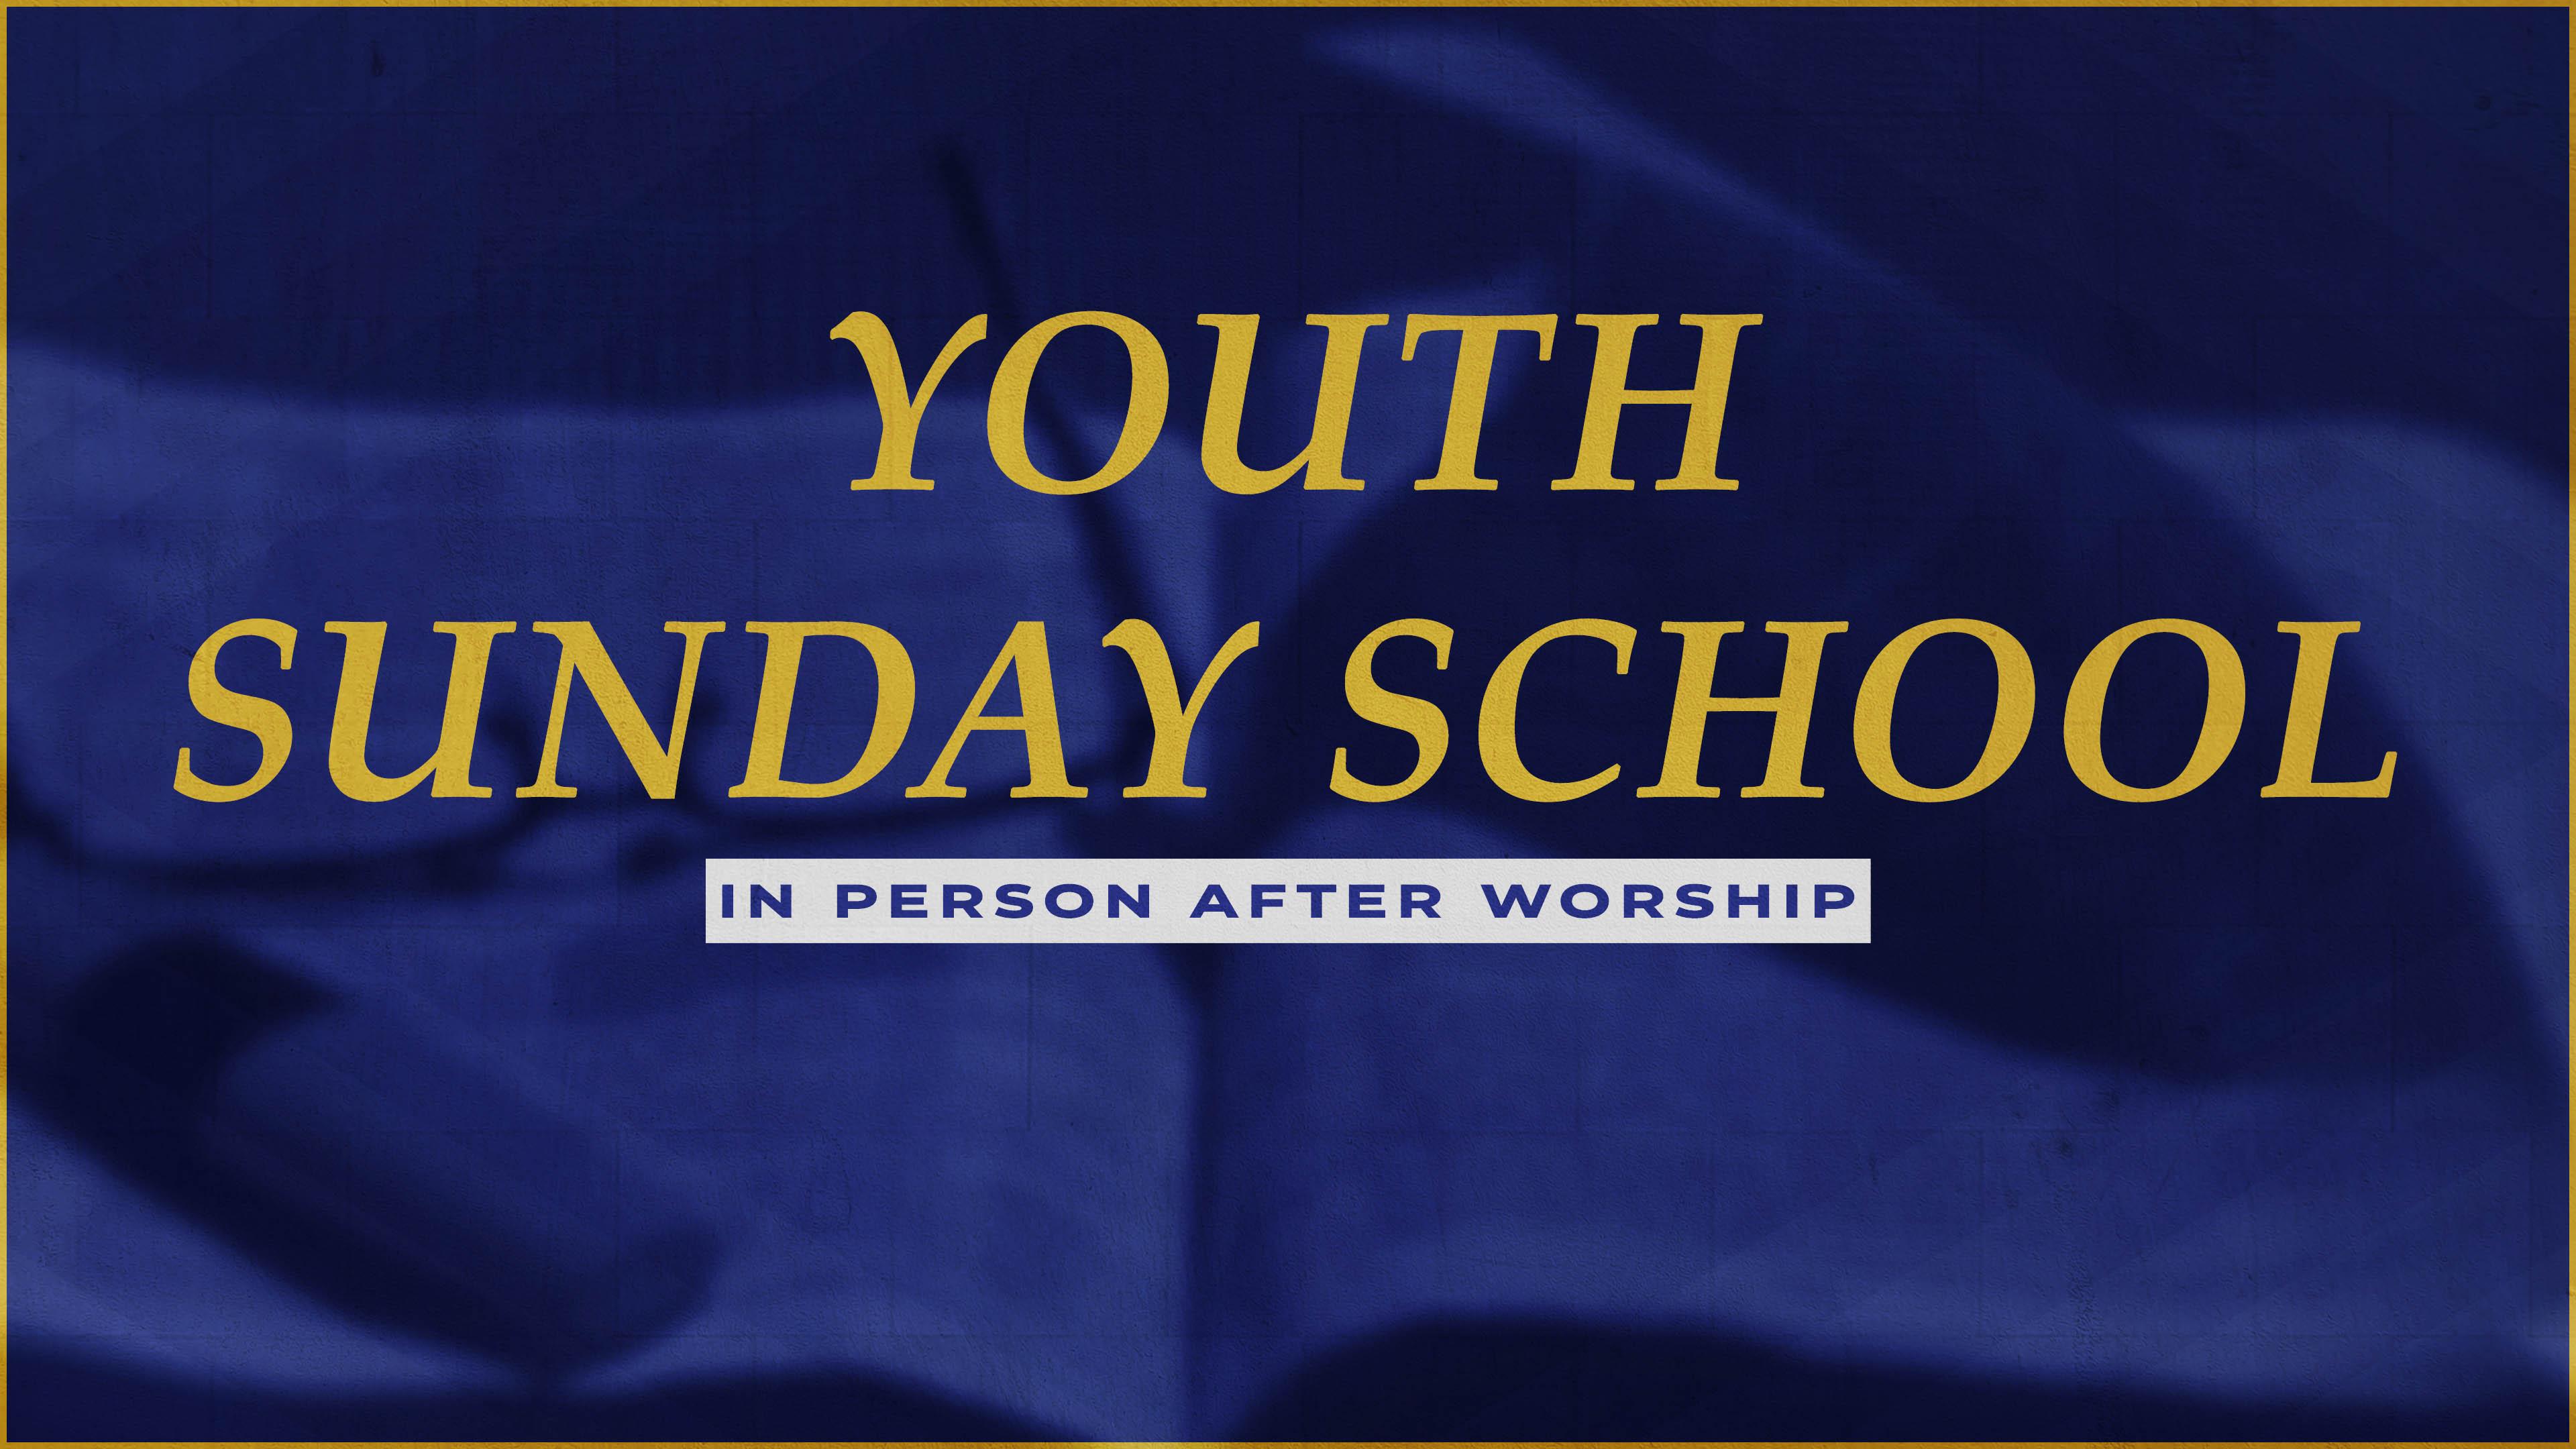 Sunday_School_Traditional_Blue_Duotone_Photo_Yellow_Text